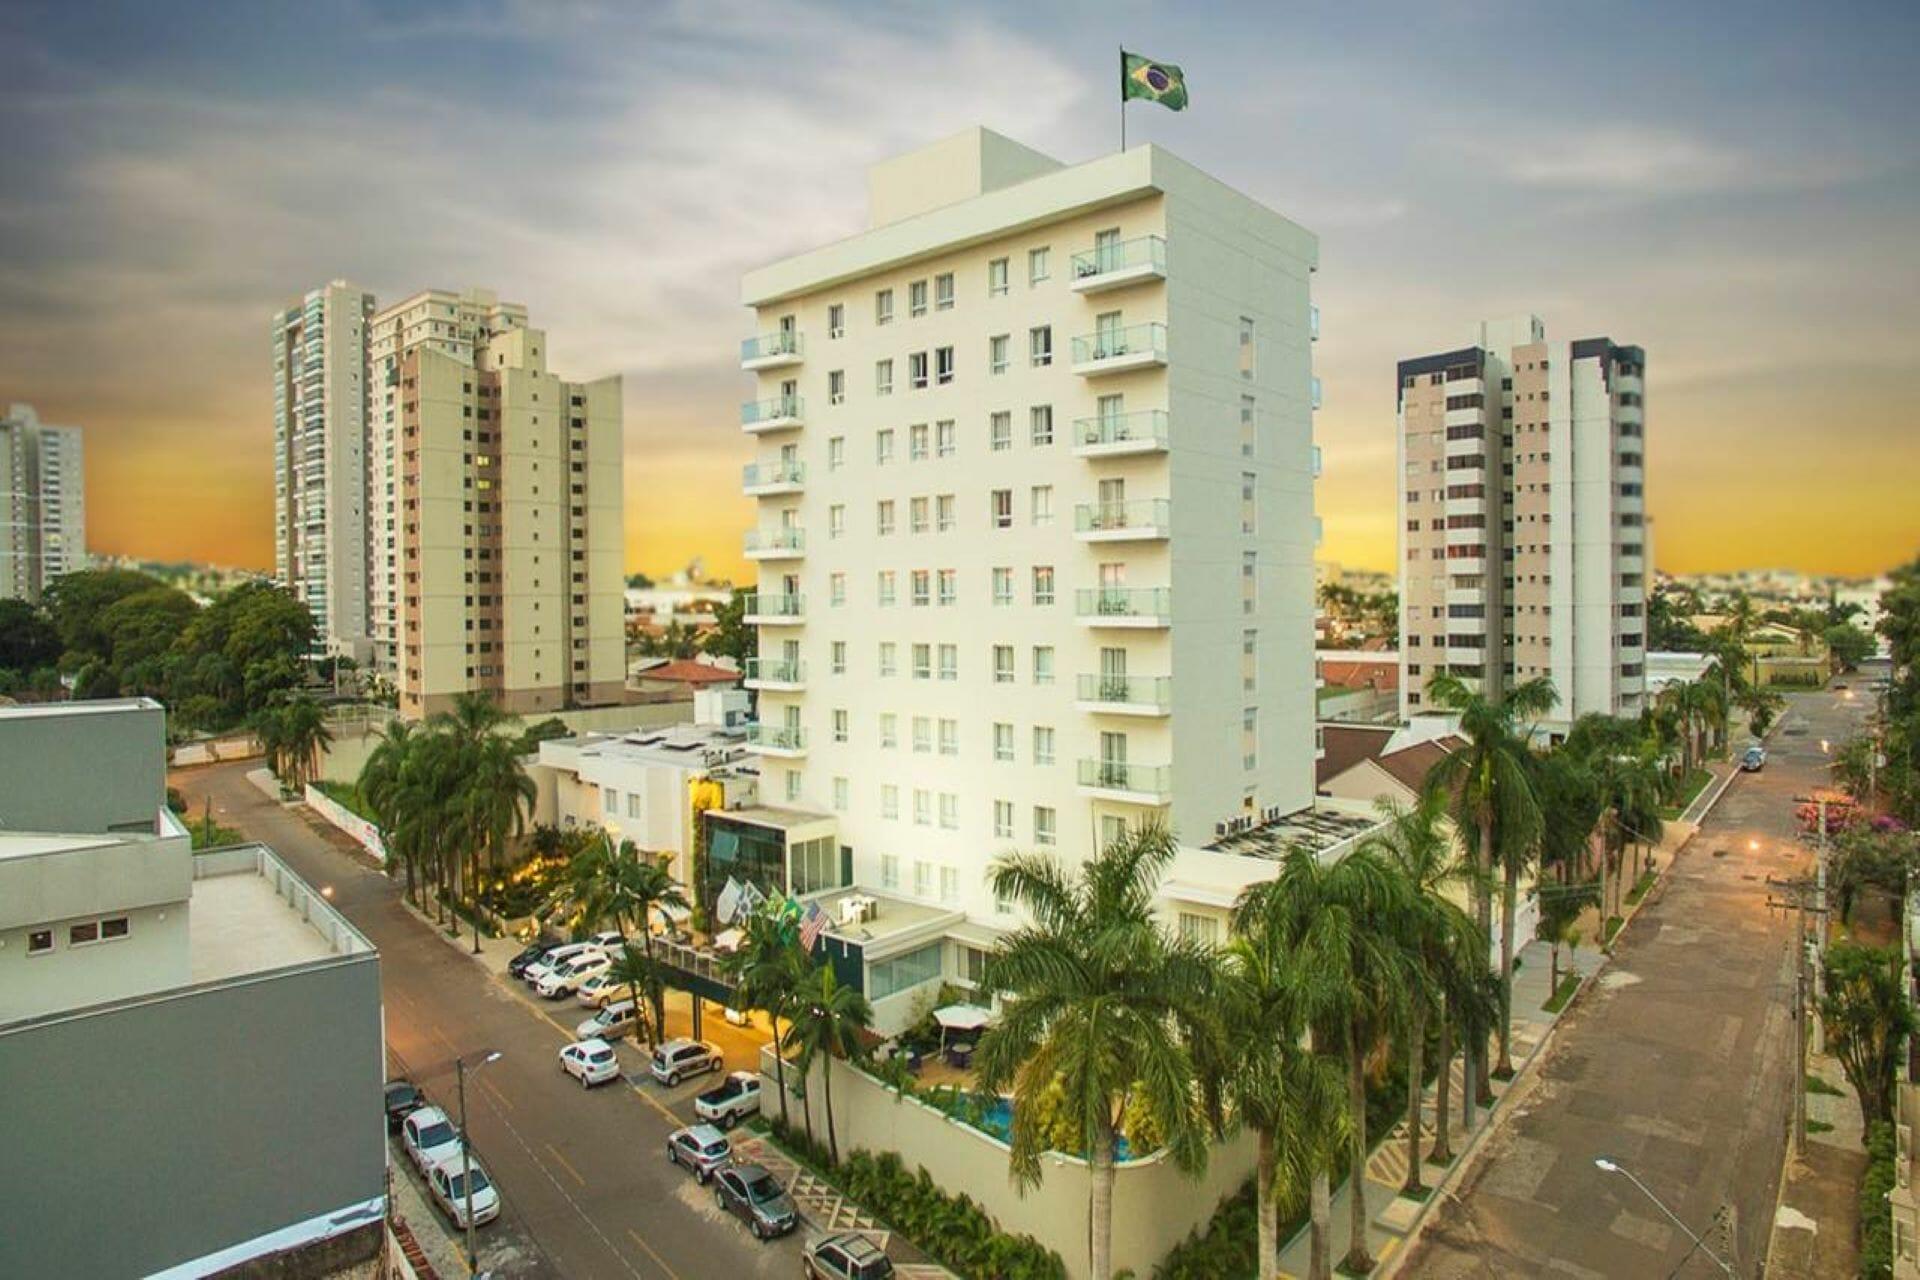 New Radisson Hotel in Anápolis, Brazil Opens